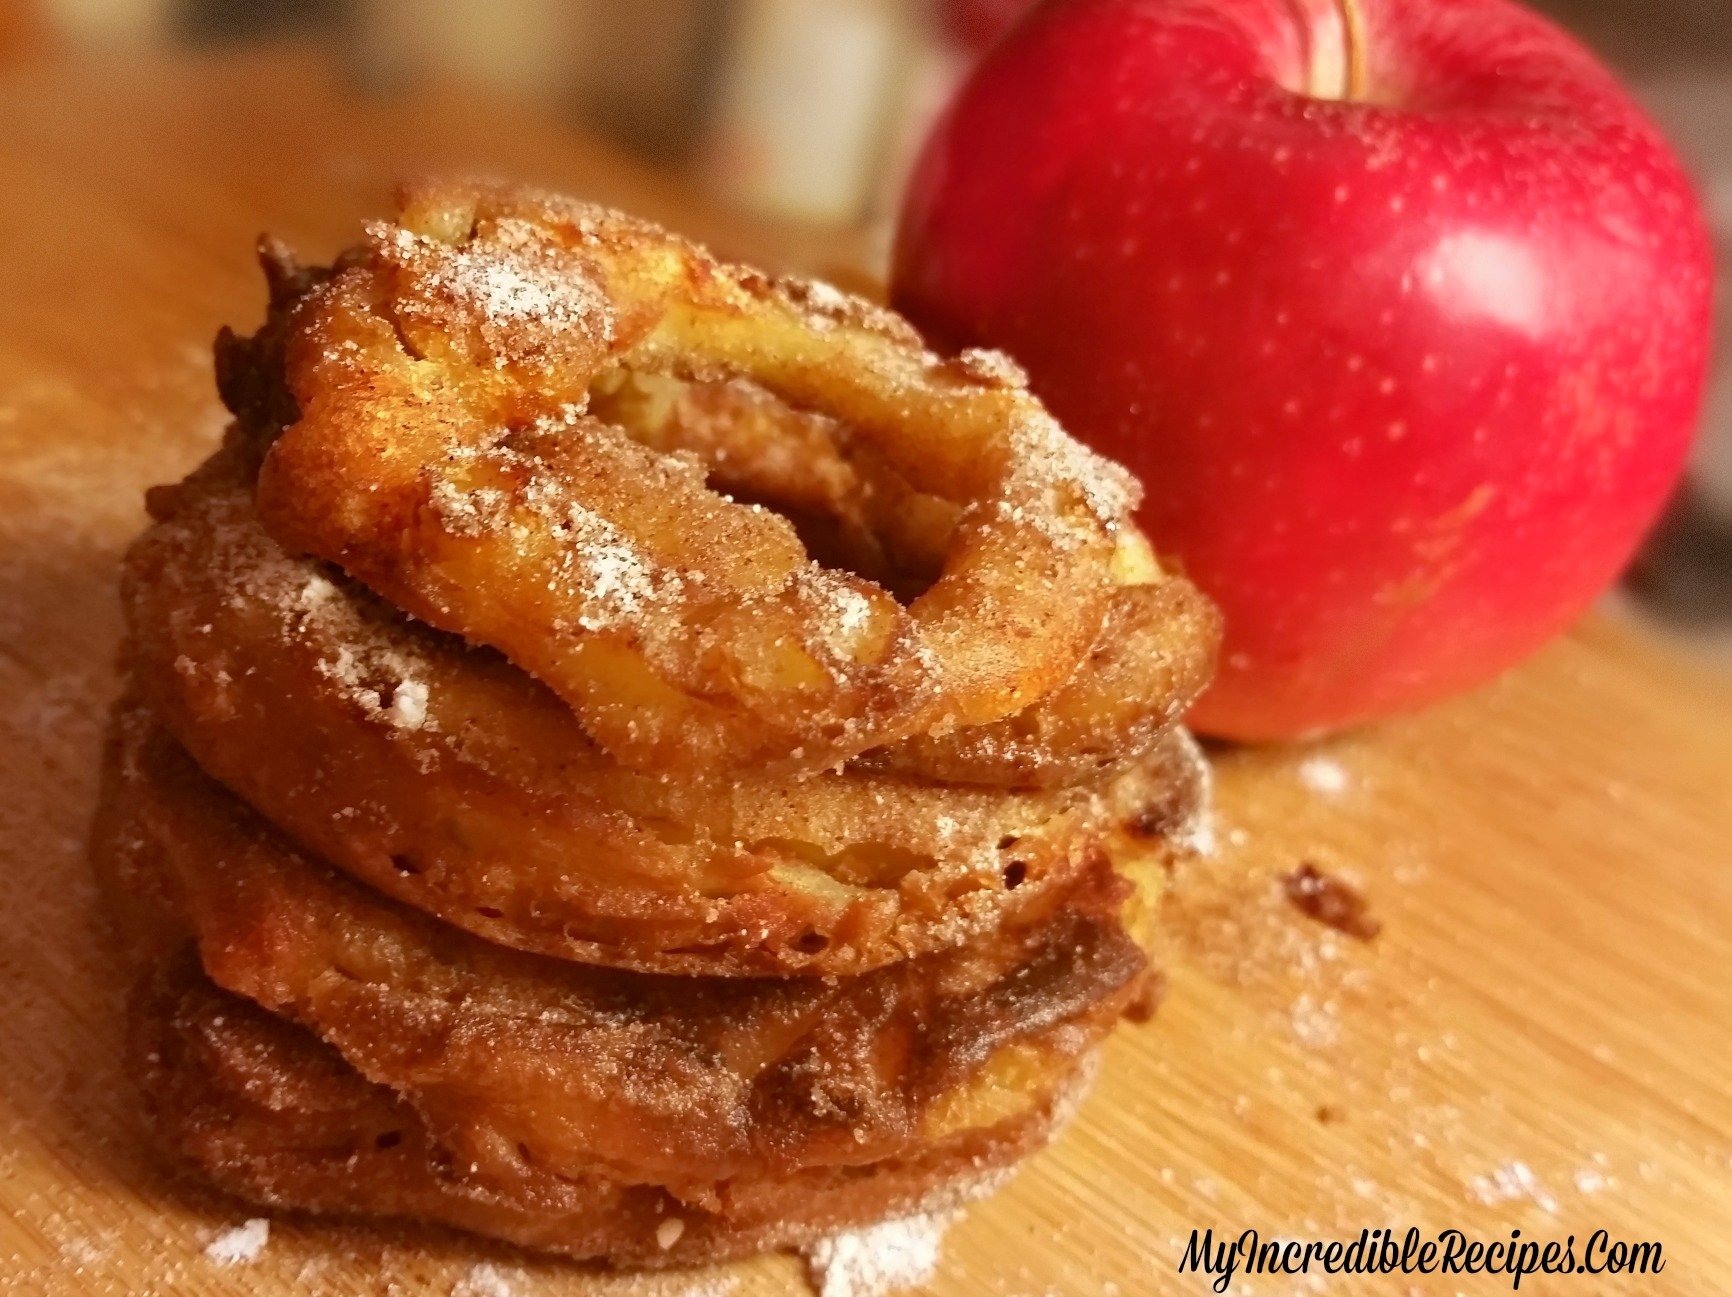 Cinnamon Sugar Apple Rings